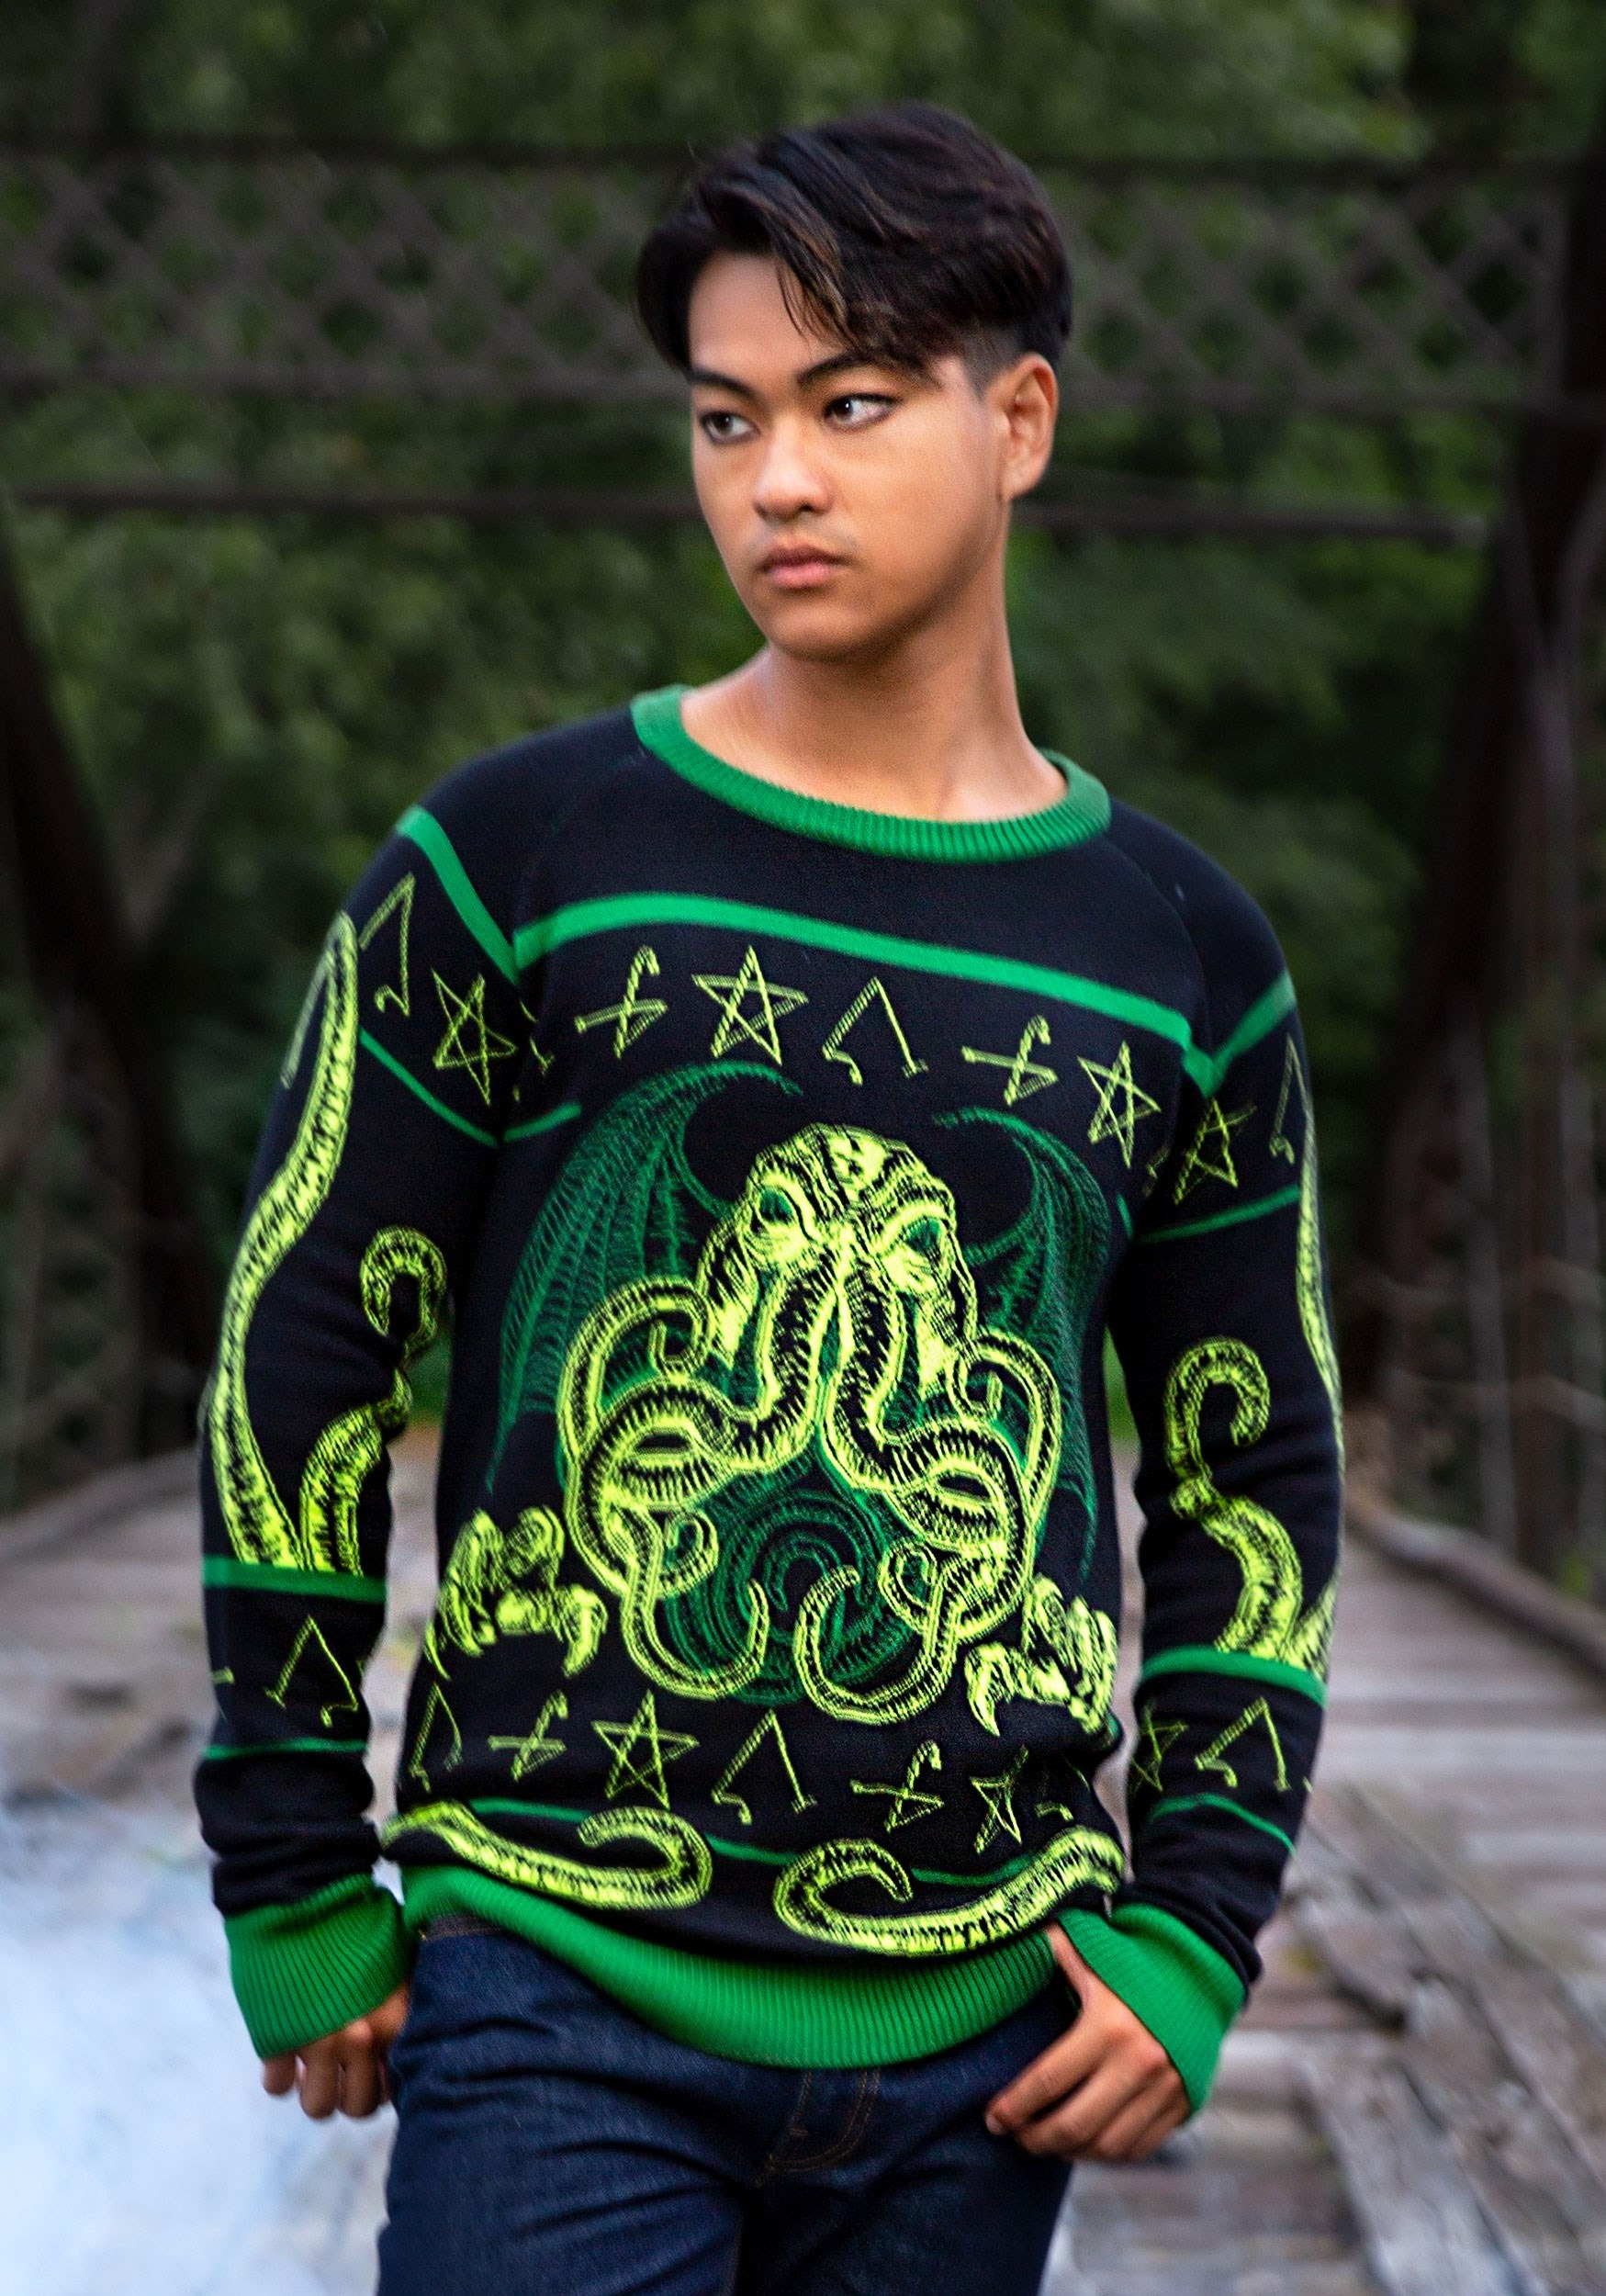 Rage of Cthulhu Halloween Sweater